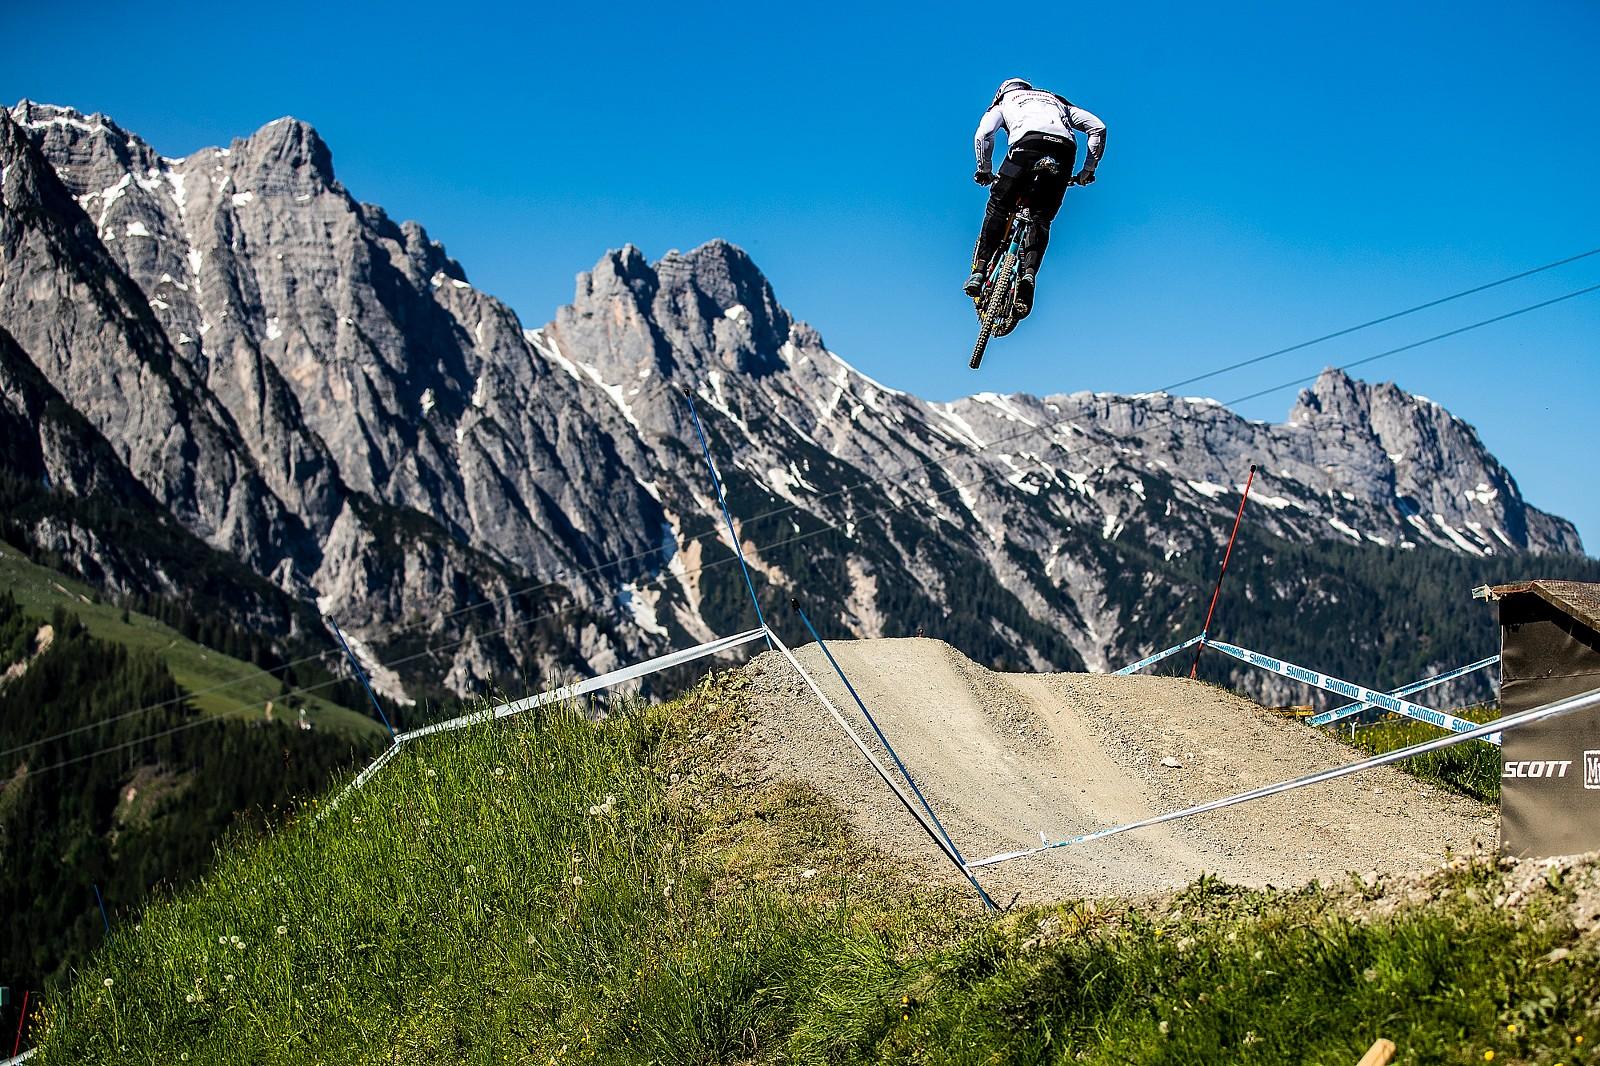 Lofting in Leogang - Brook Macdonald - A Big Bad Batch of Brook Macdonald Bangers - Mountain Biking Pictures - Vital MTB